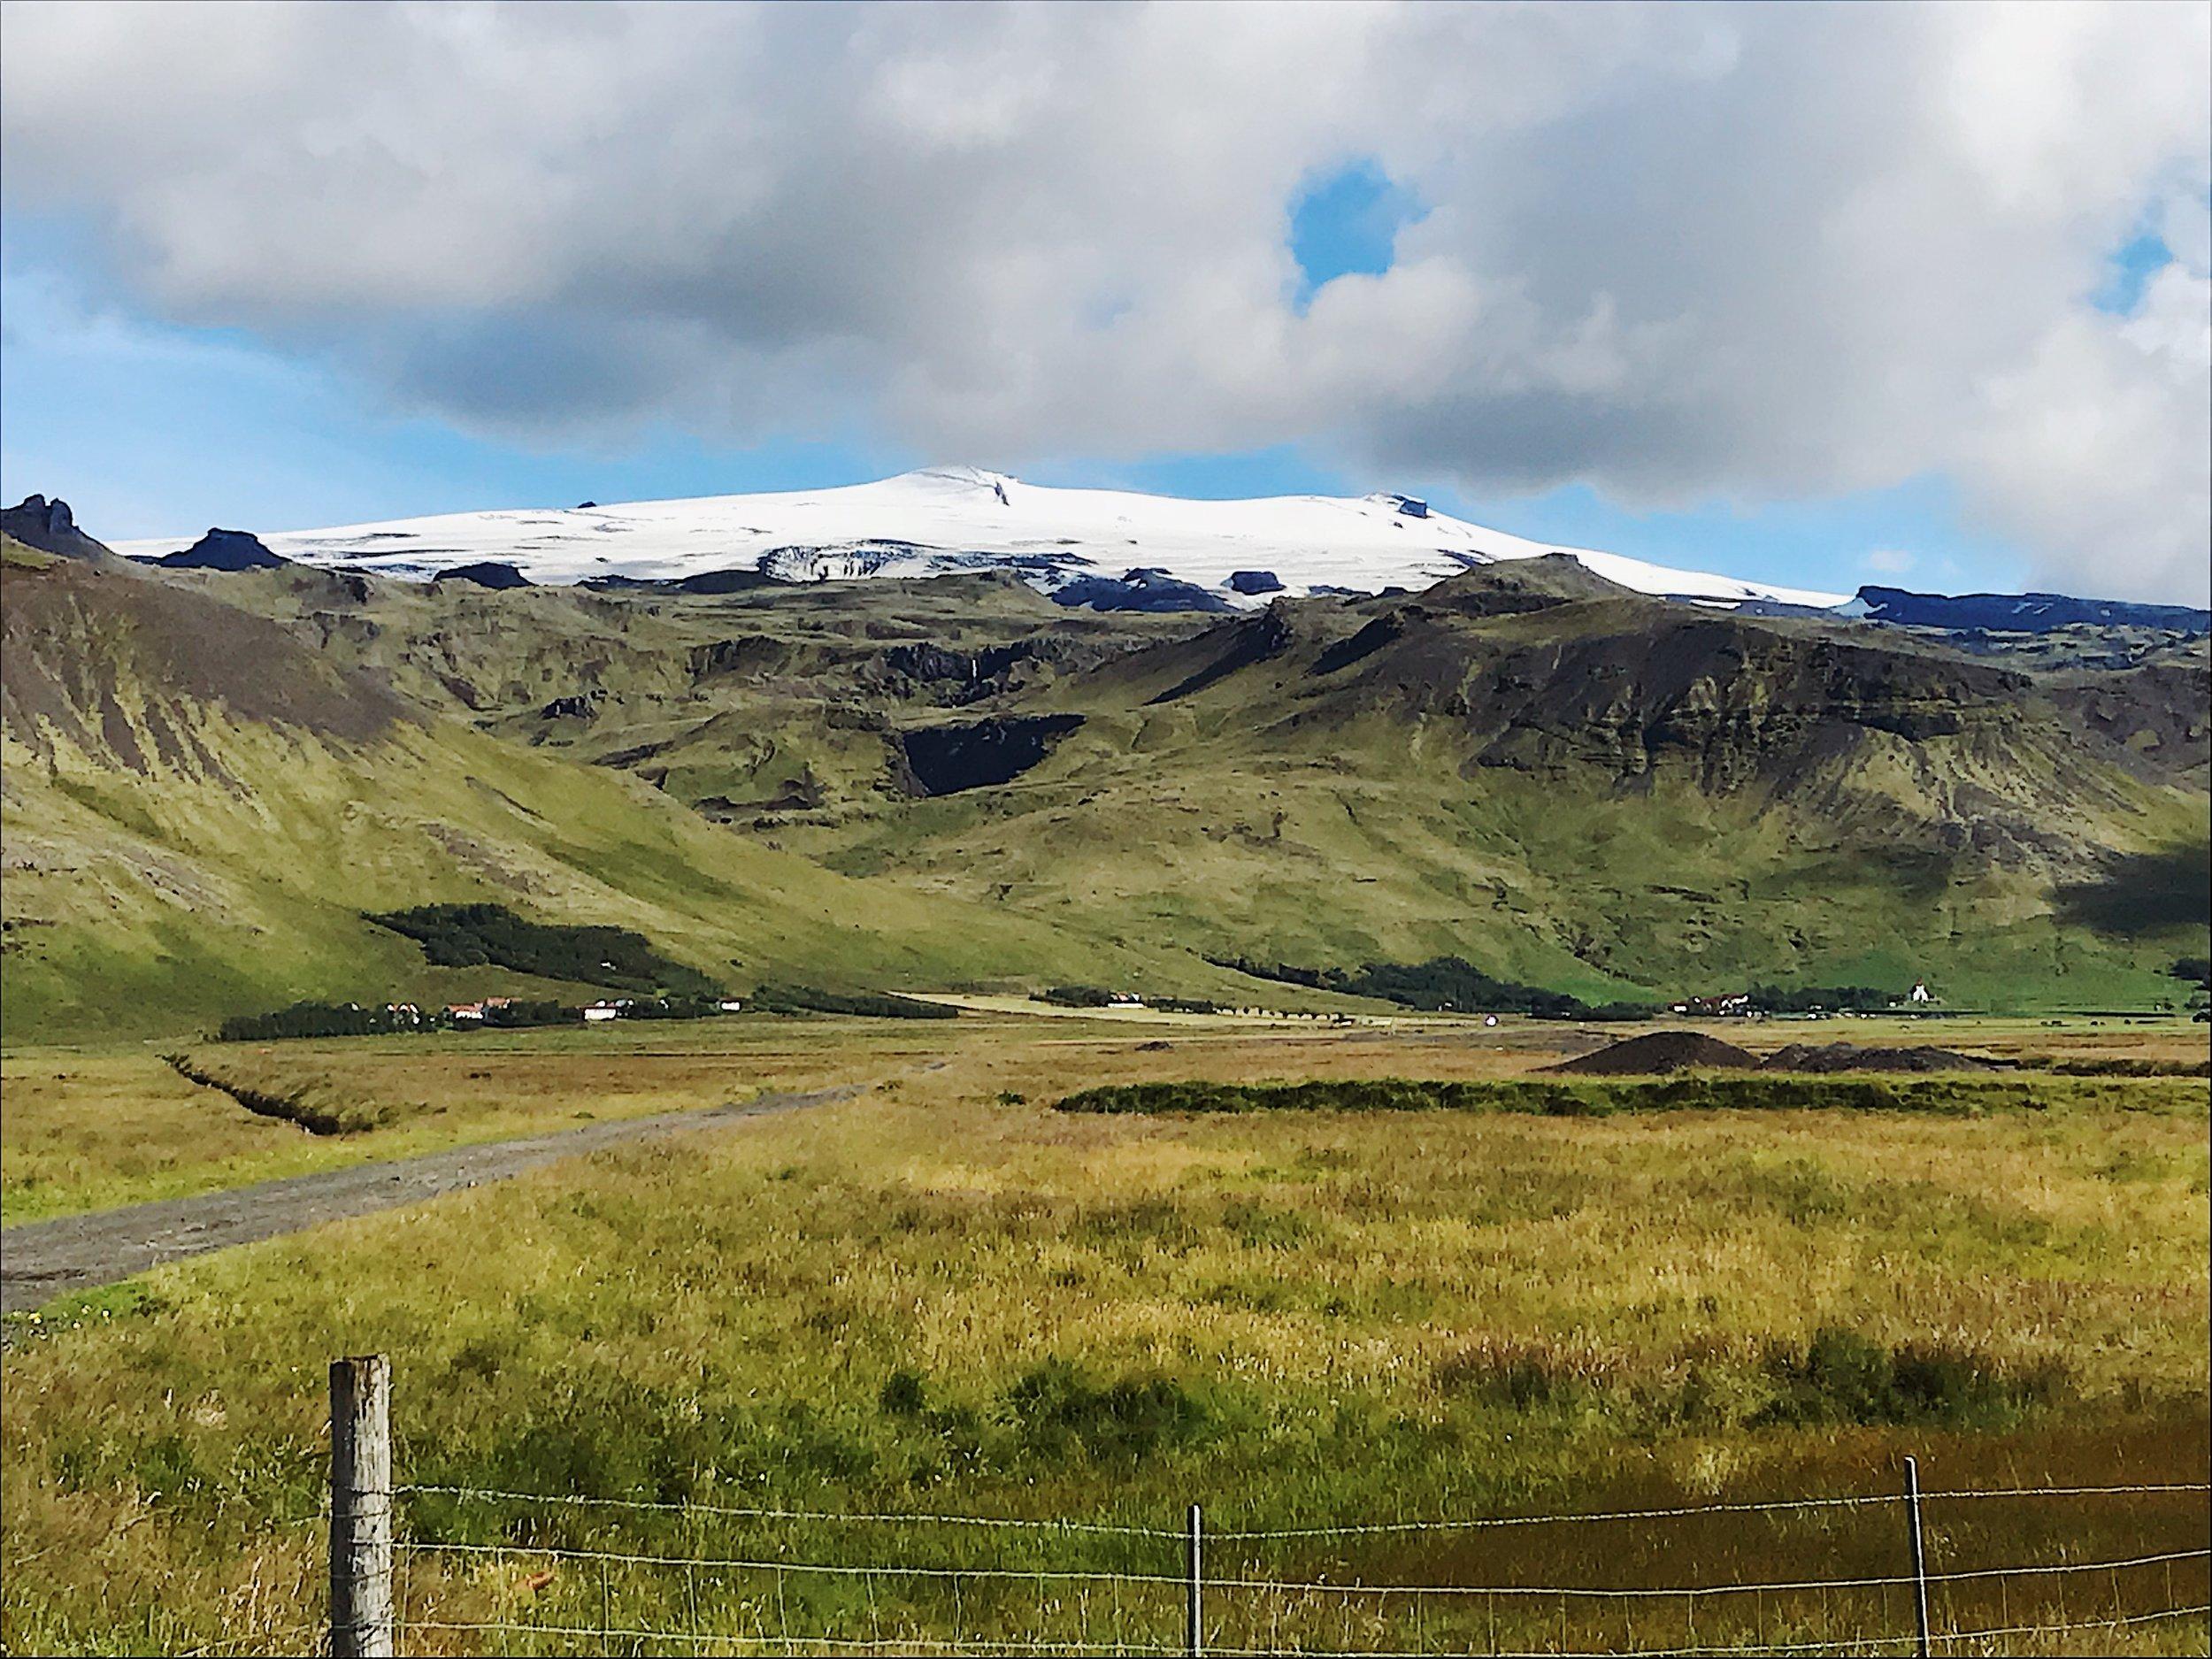 Solheimajökull Glacier in the distance